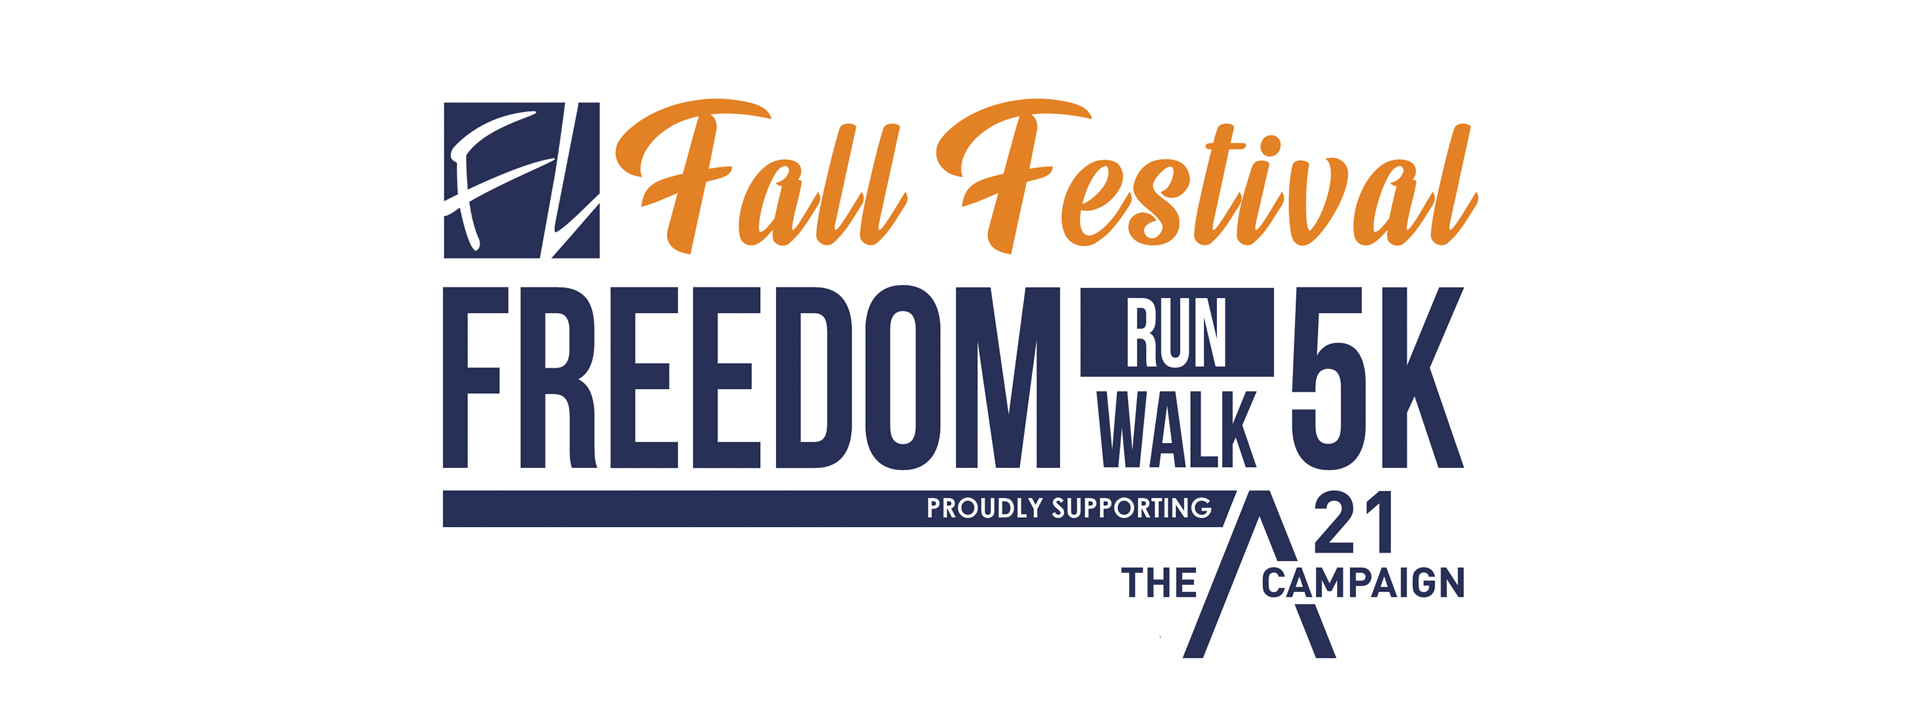 Fall Festival and Freedom 5K Wide.jpg